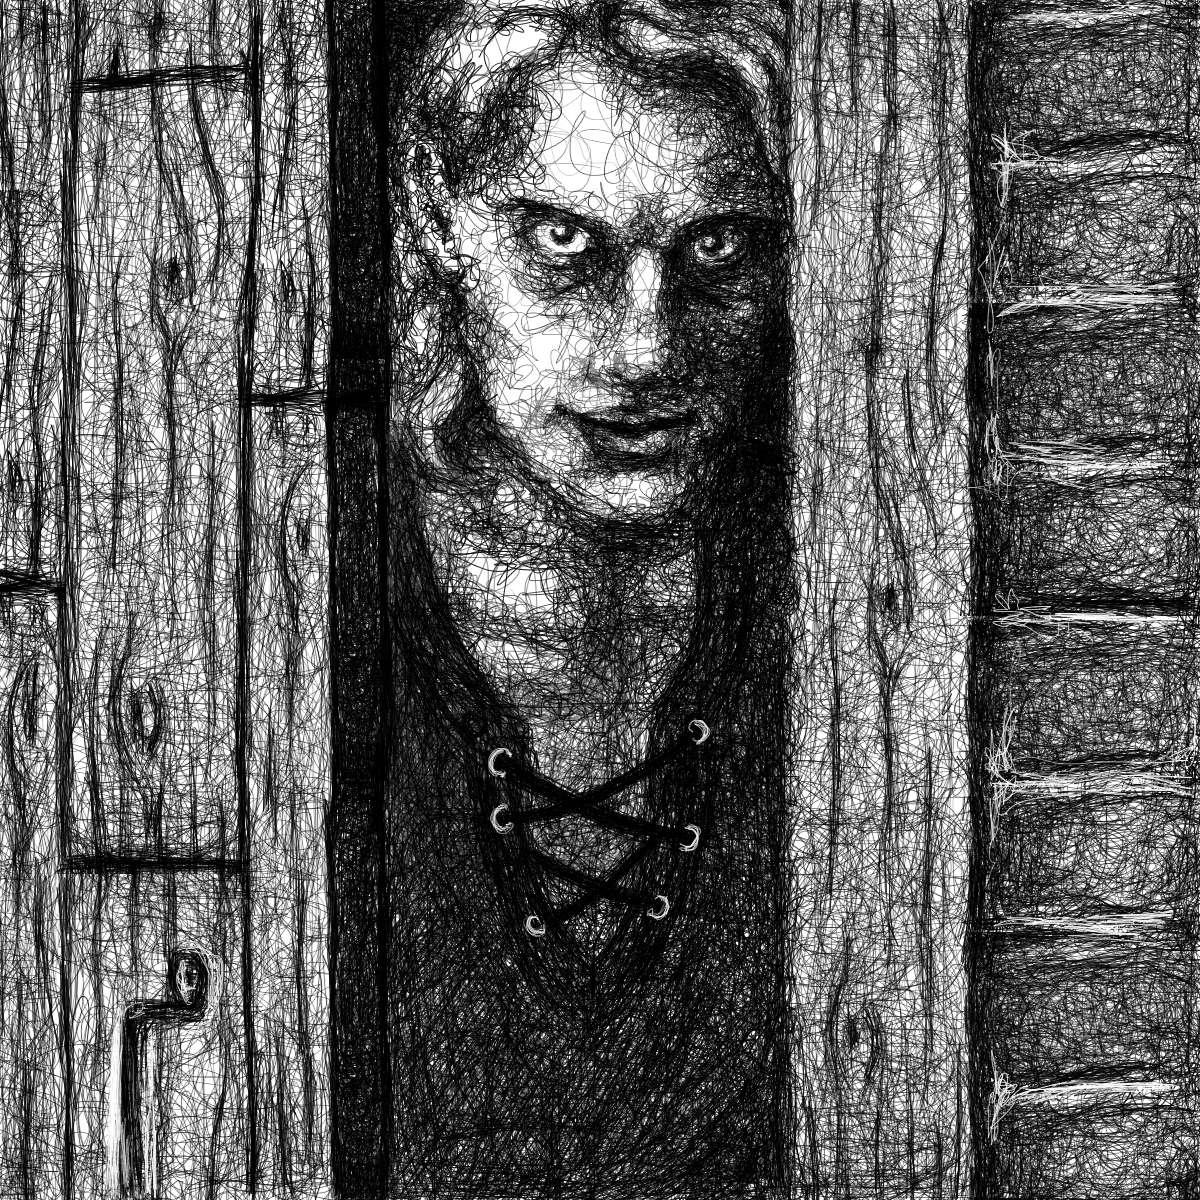 Michael Stauner - Angriff der Vampire: Tabor at door (illustration of book scene)